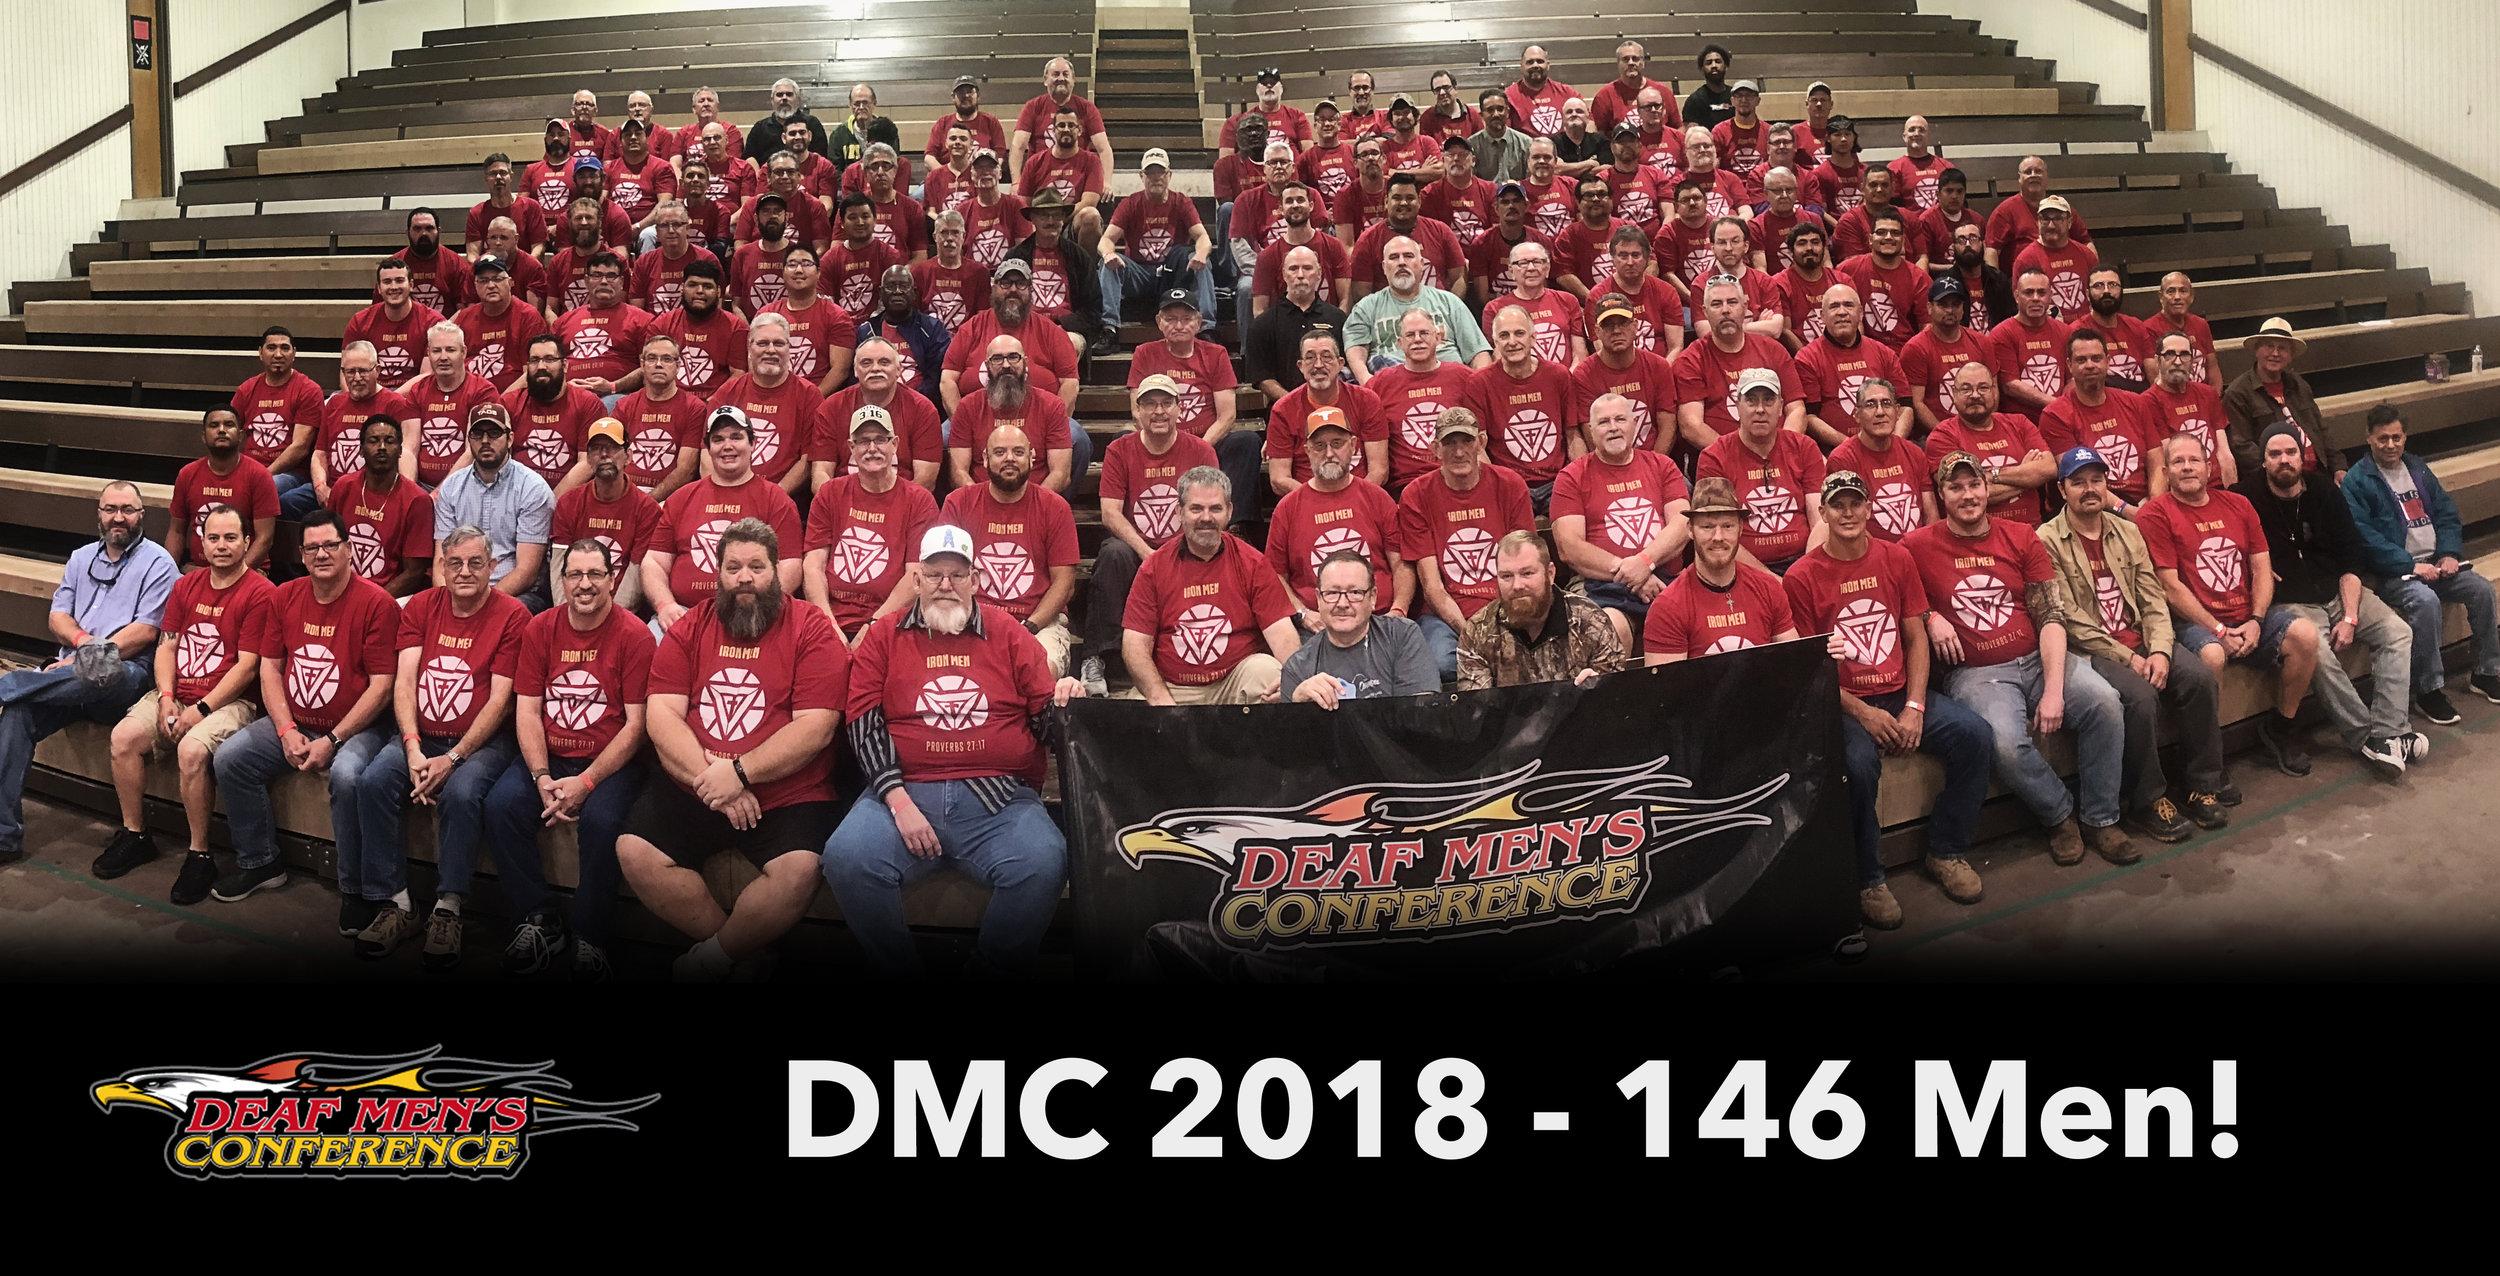 dmc2018 group.jpg